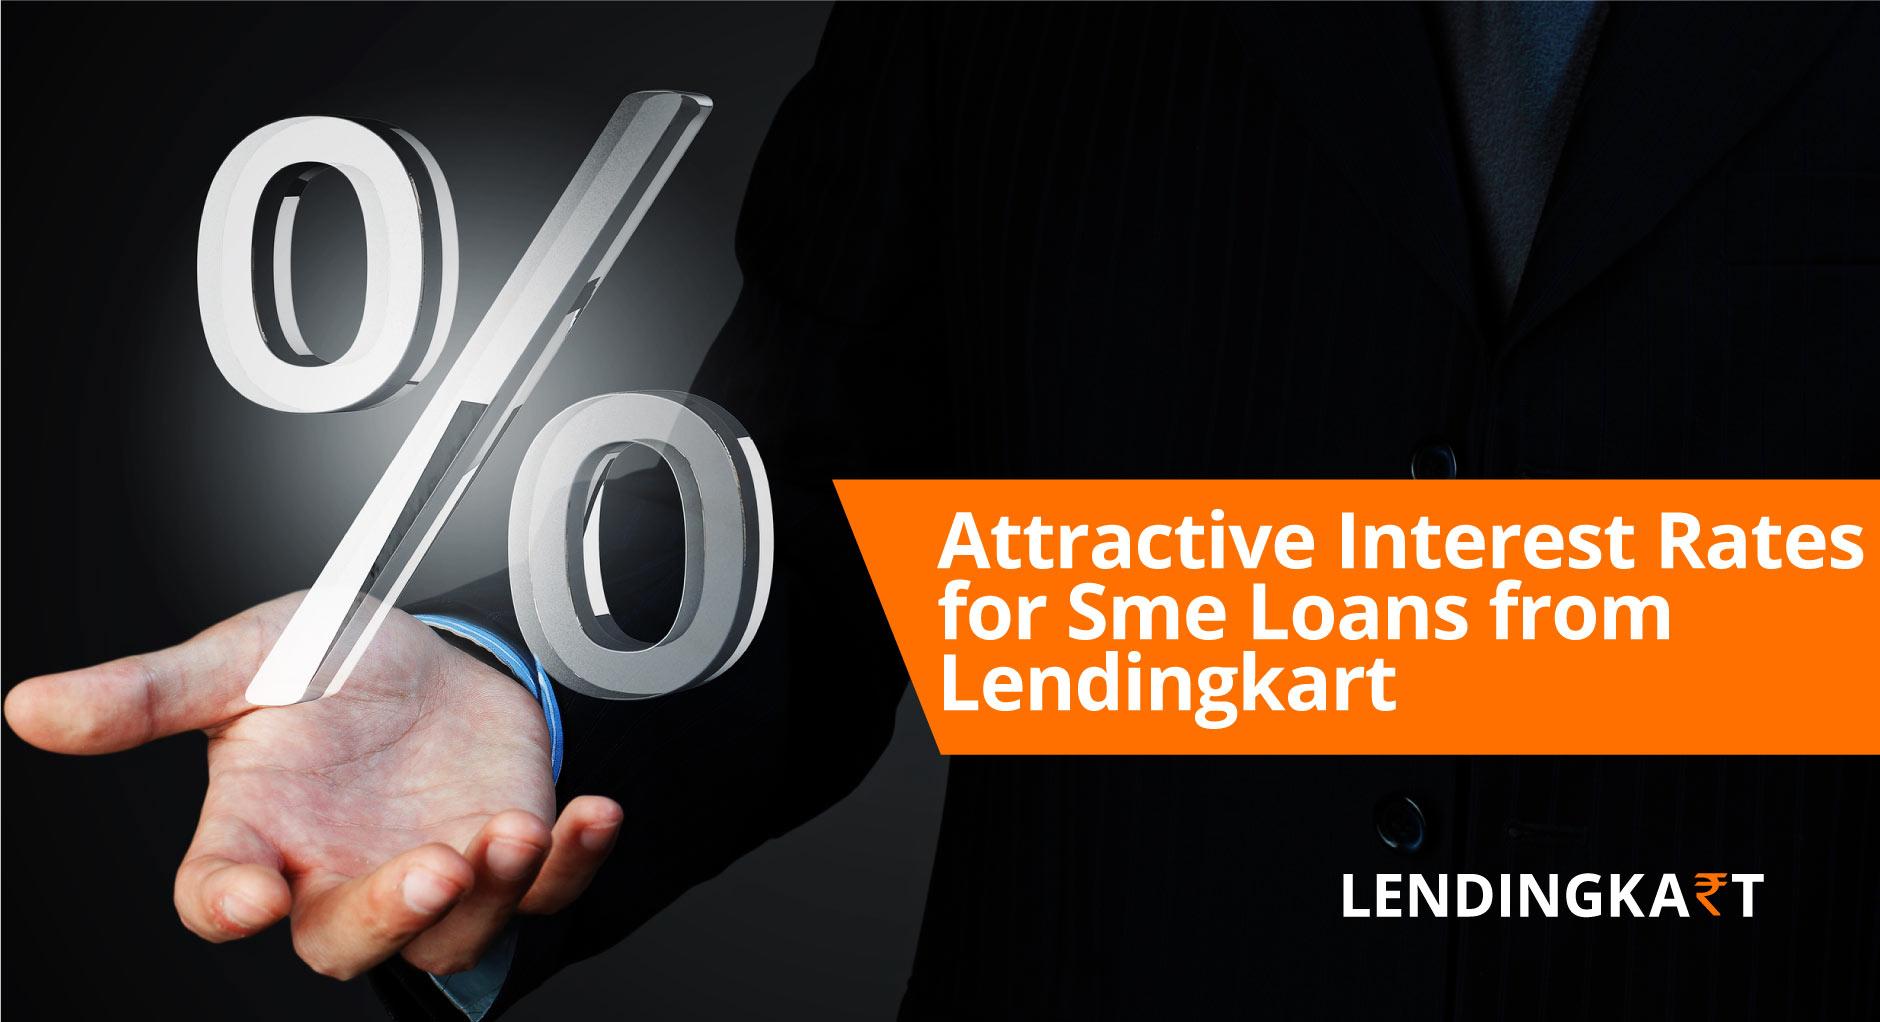 Attractive Interest Rates from Lendingkart